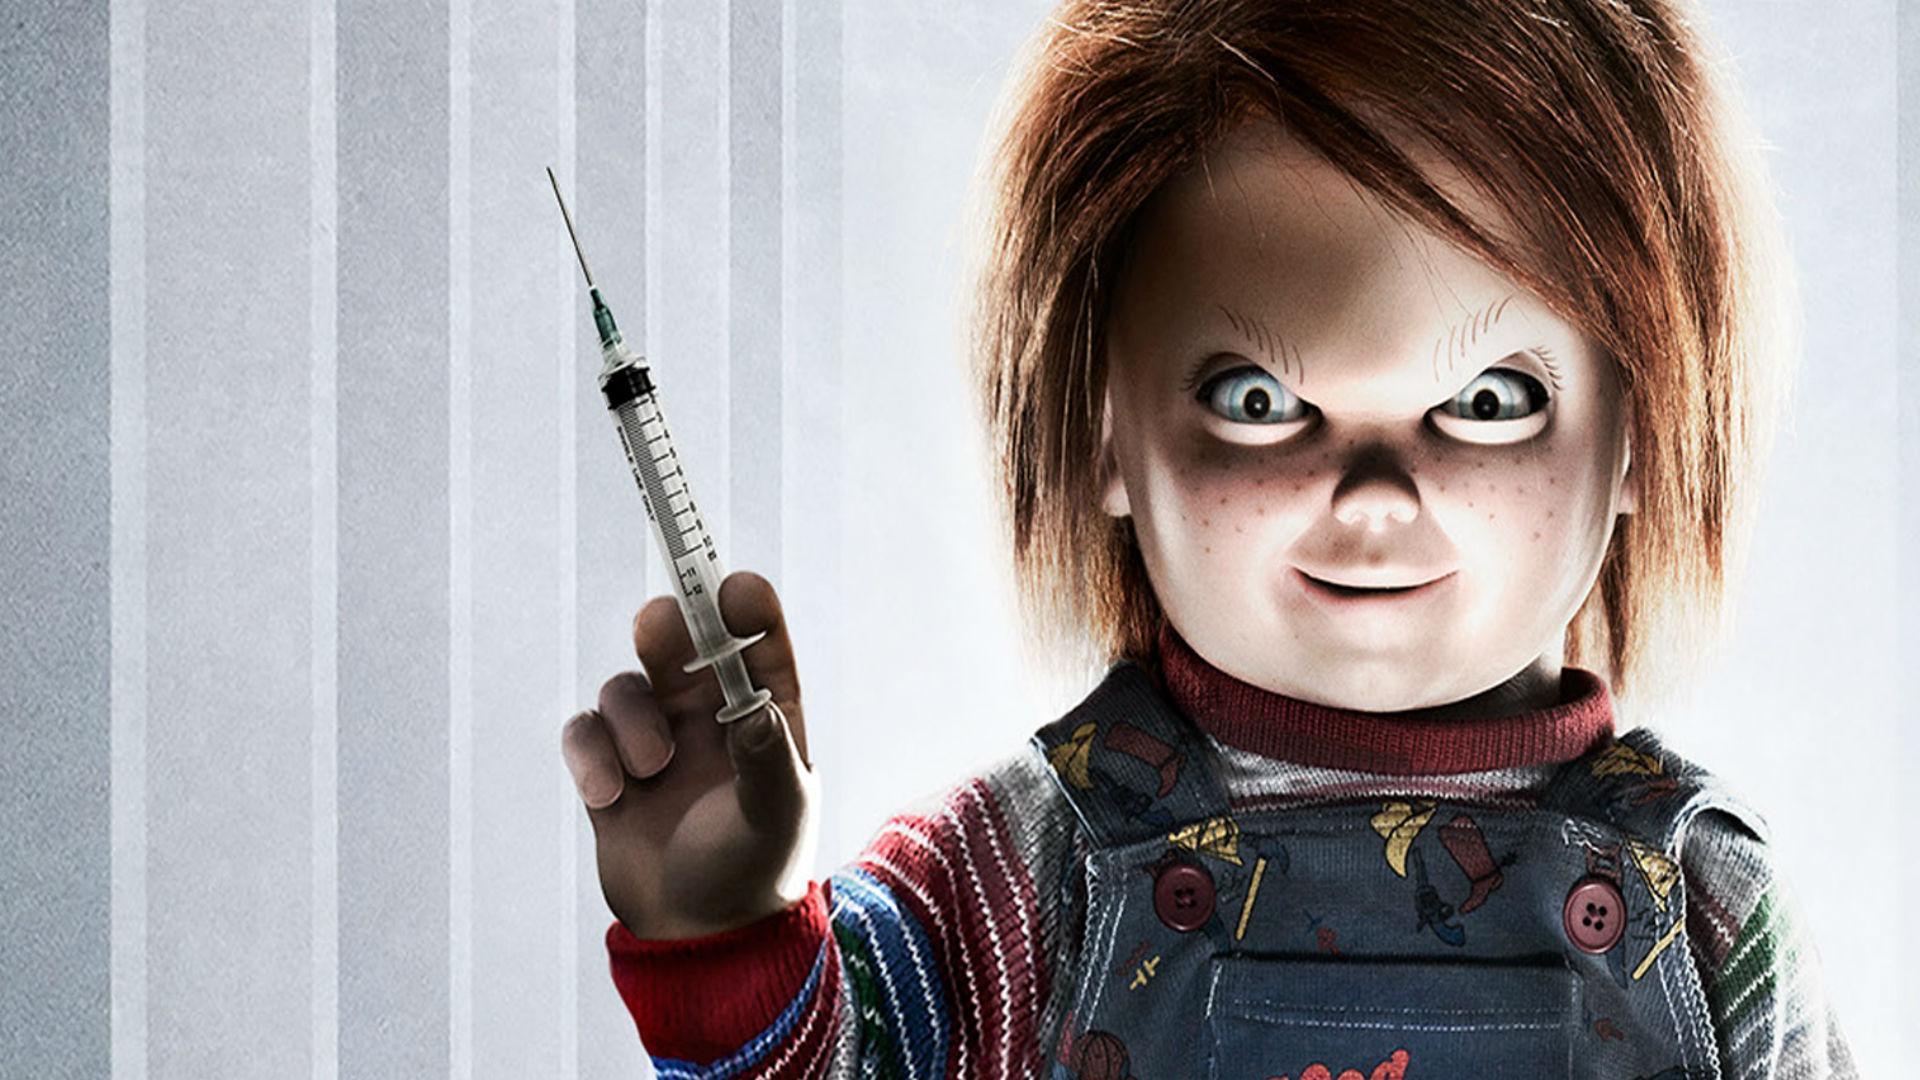 Cult of Chucky - Chucky kultusza (2017)